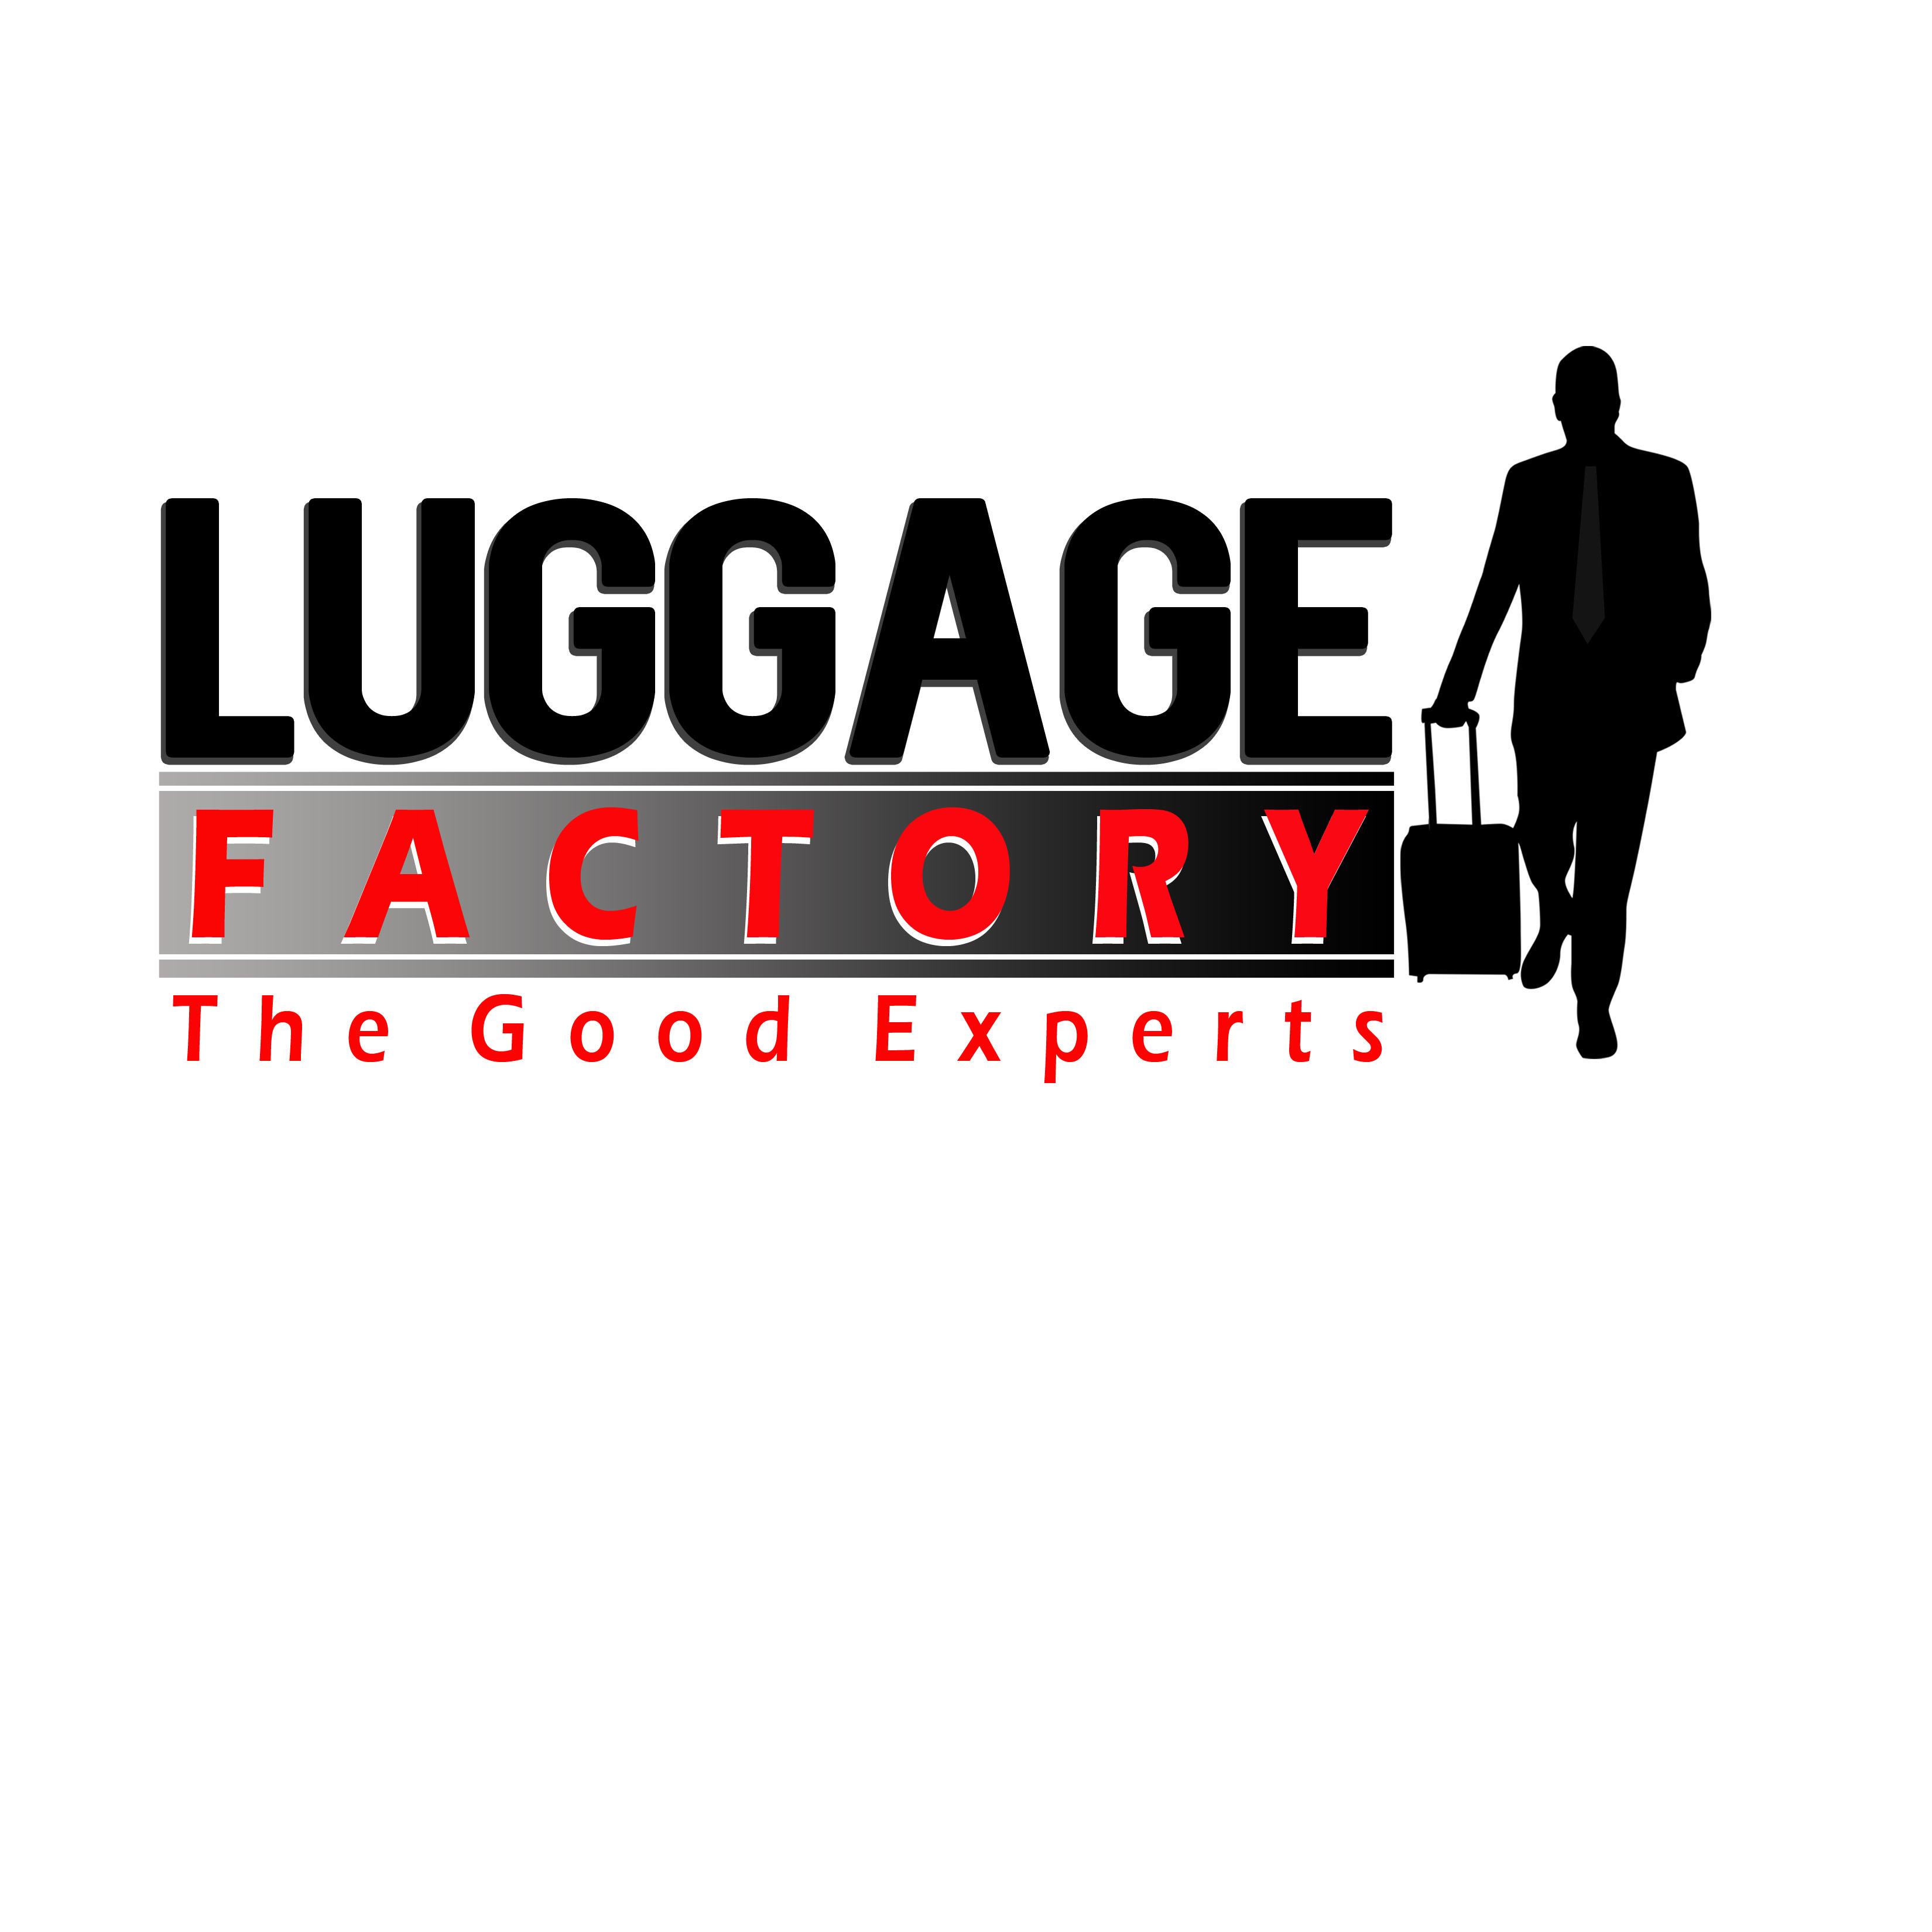 Logo Design by Allan Esclamado - Entry No. 203 in the Logo Design Contest Creative Logo Design for Luggage Factory.